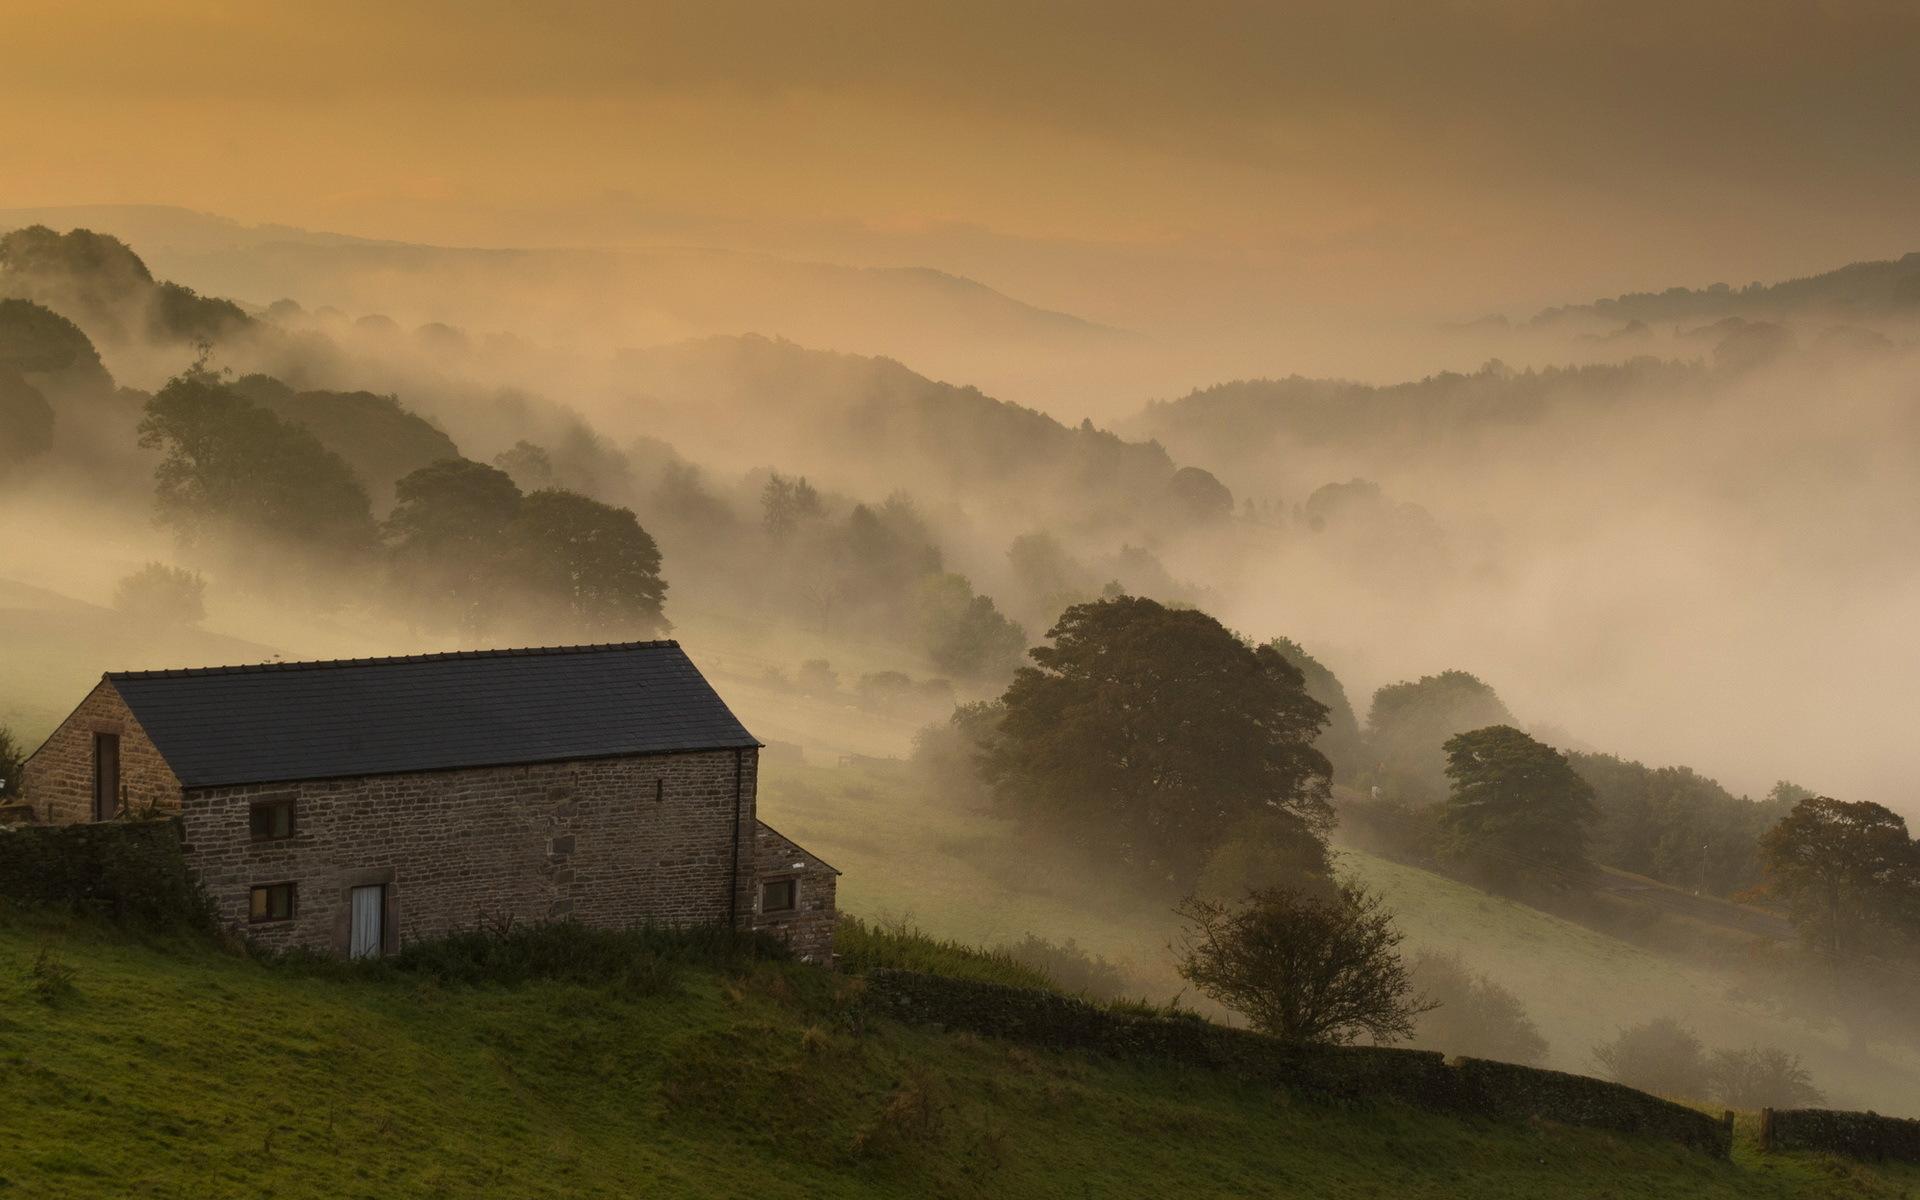 Farmhouse Plan Morning House Field Fog Landscape Wallpaper 1920x1200